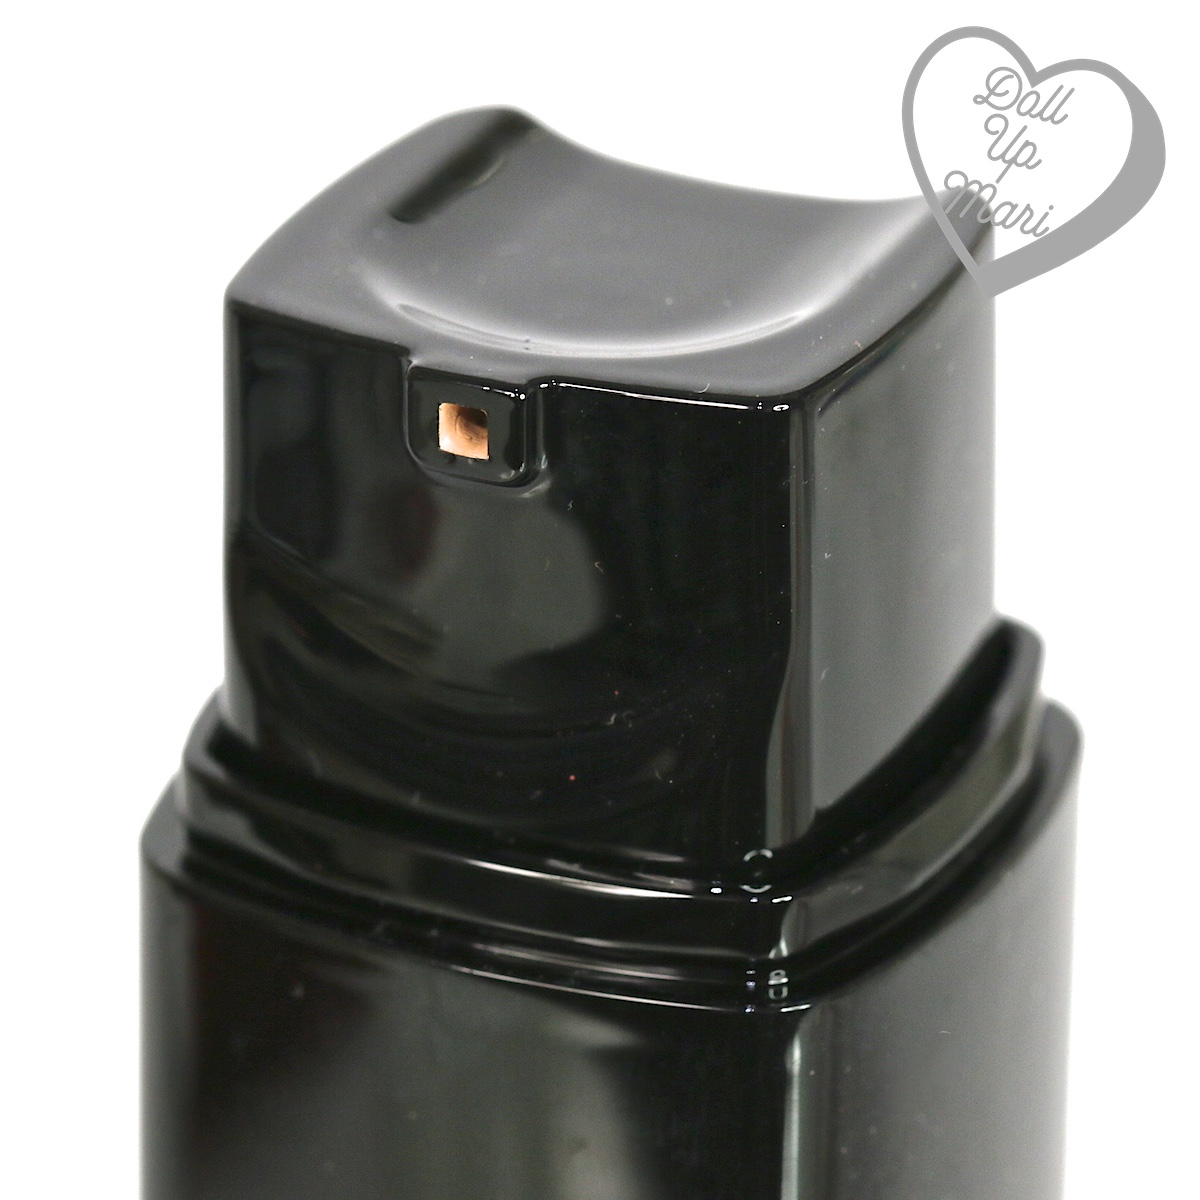 bottle nozzle of L'Oréal Paris Infallible 24HR Fresh Wear Liquid Foundation SPF25PA+++ in shade Ivory